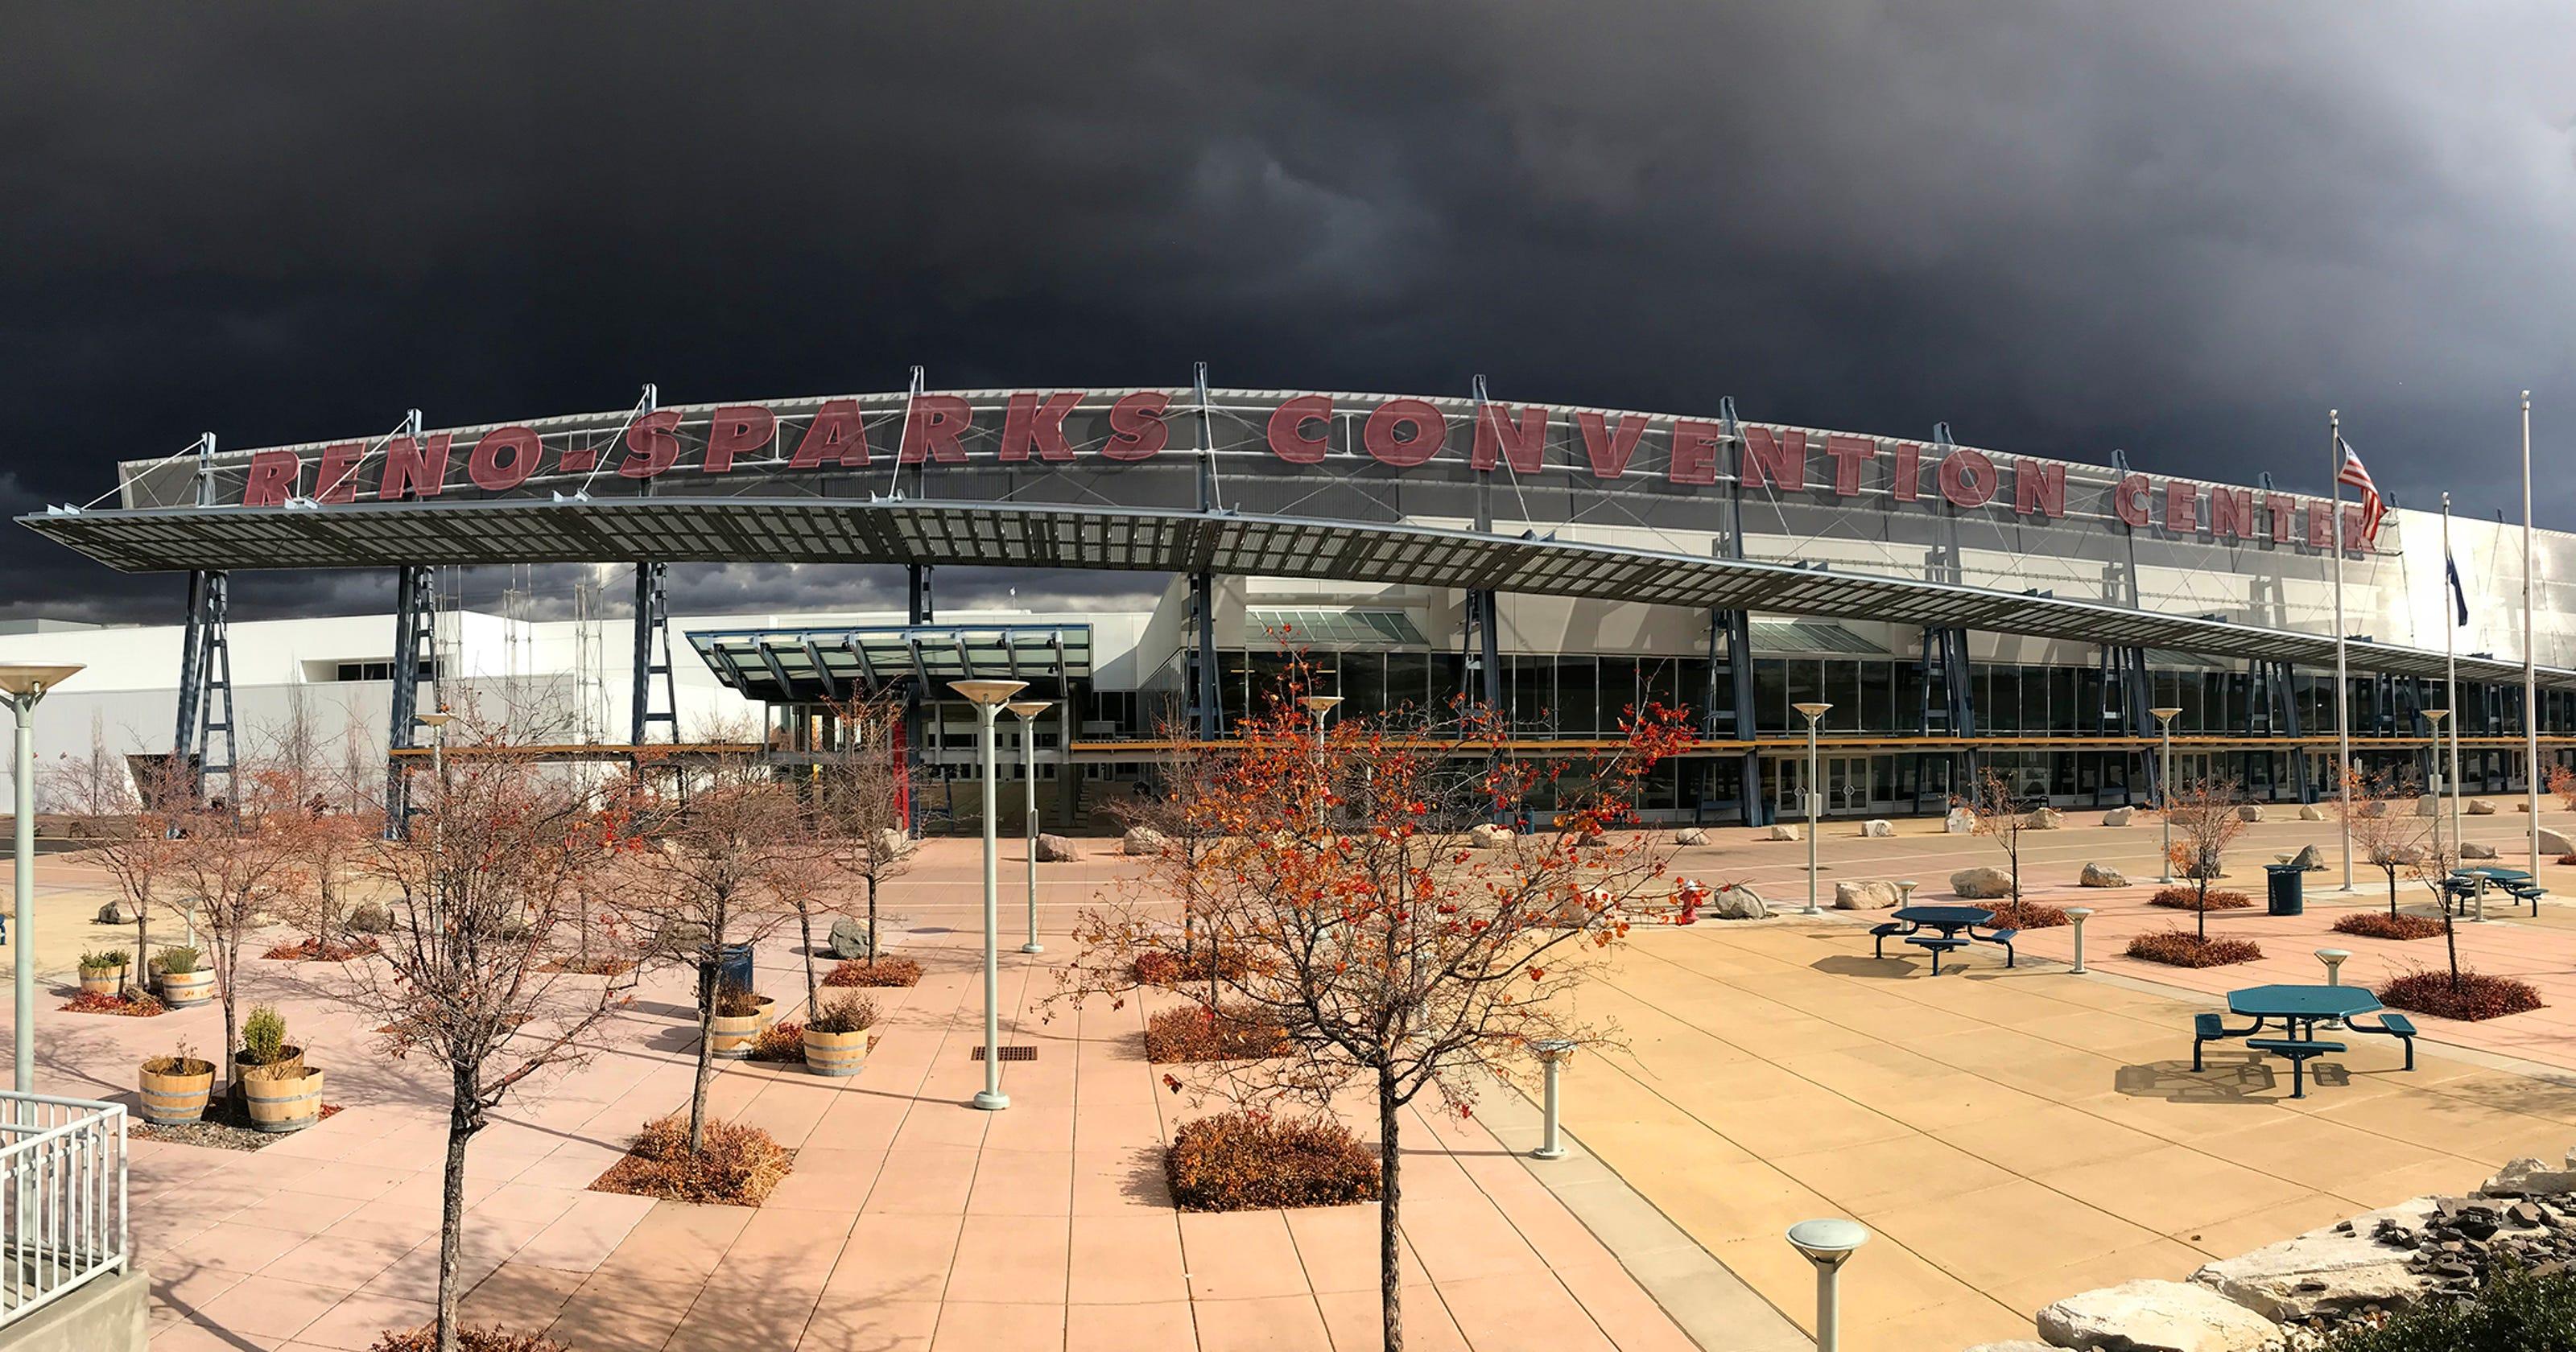 RenoSparks Convention Center Expansion Eyed For Bigger Events - Car show reno sparks convention center